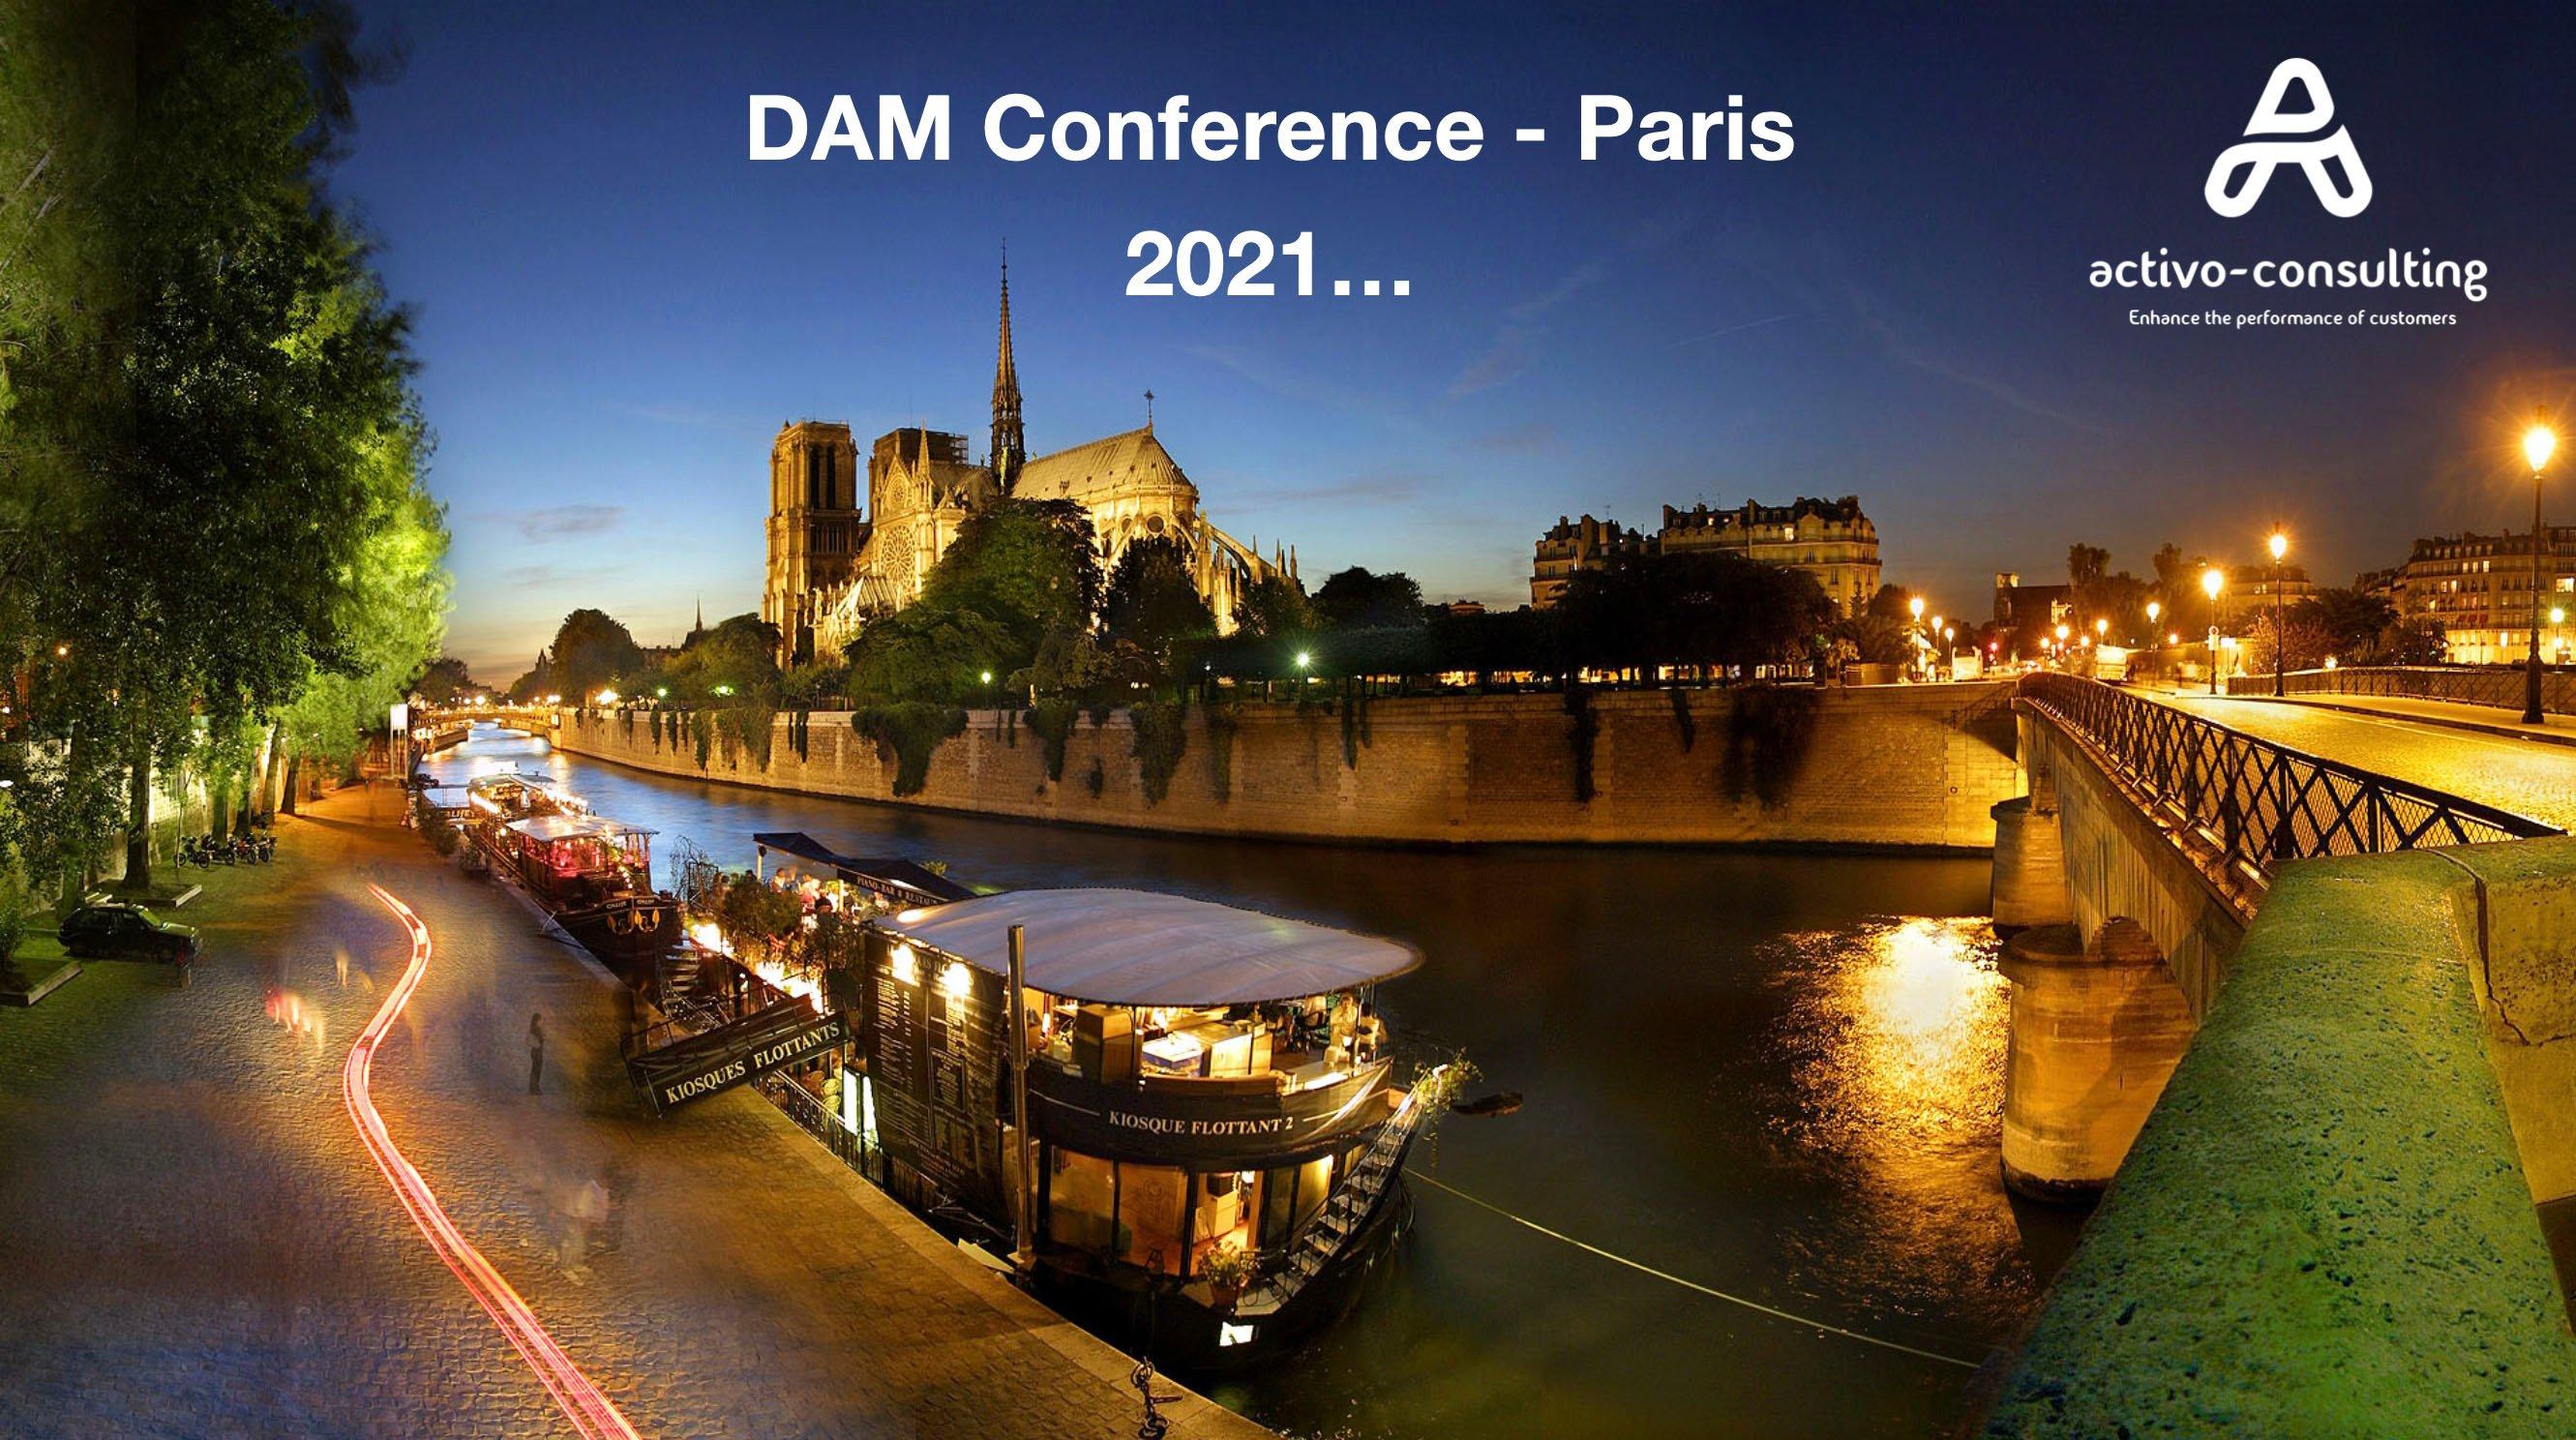 DAM Paris conference